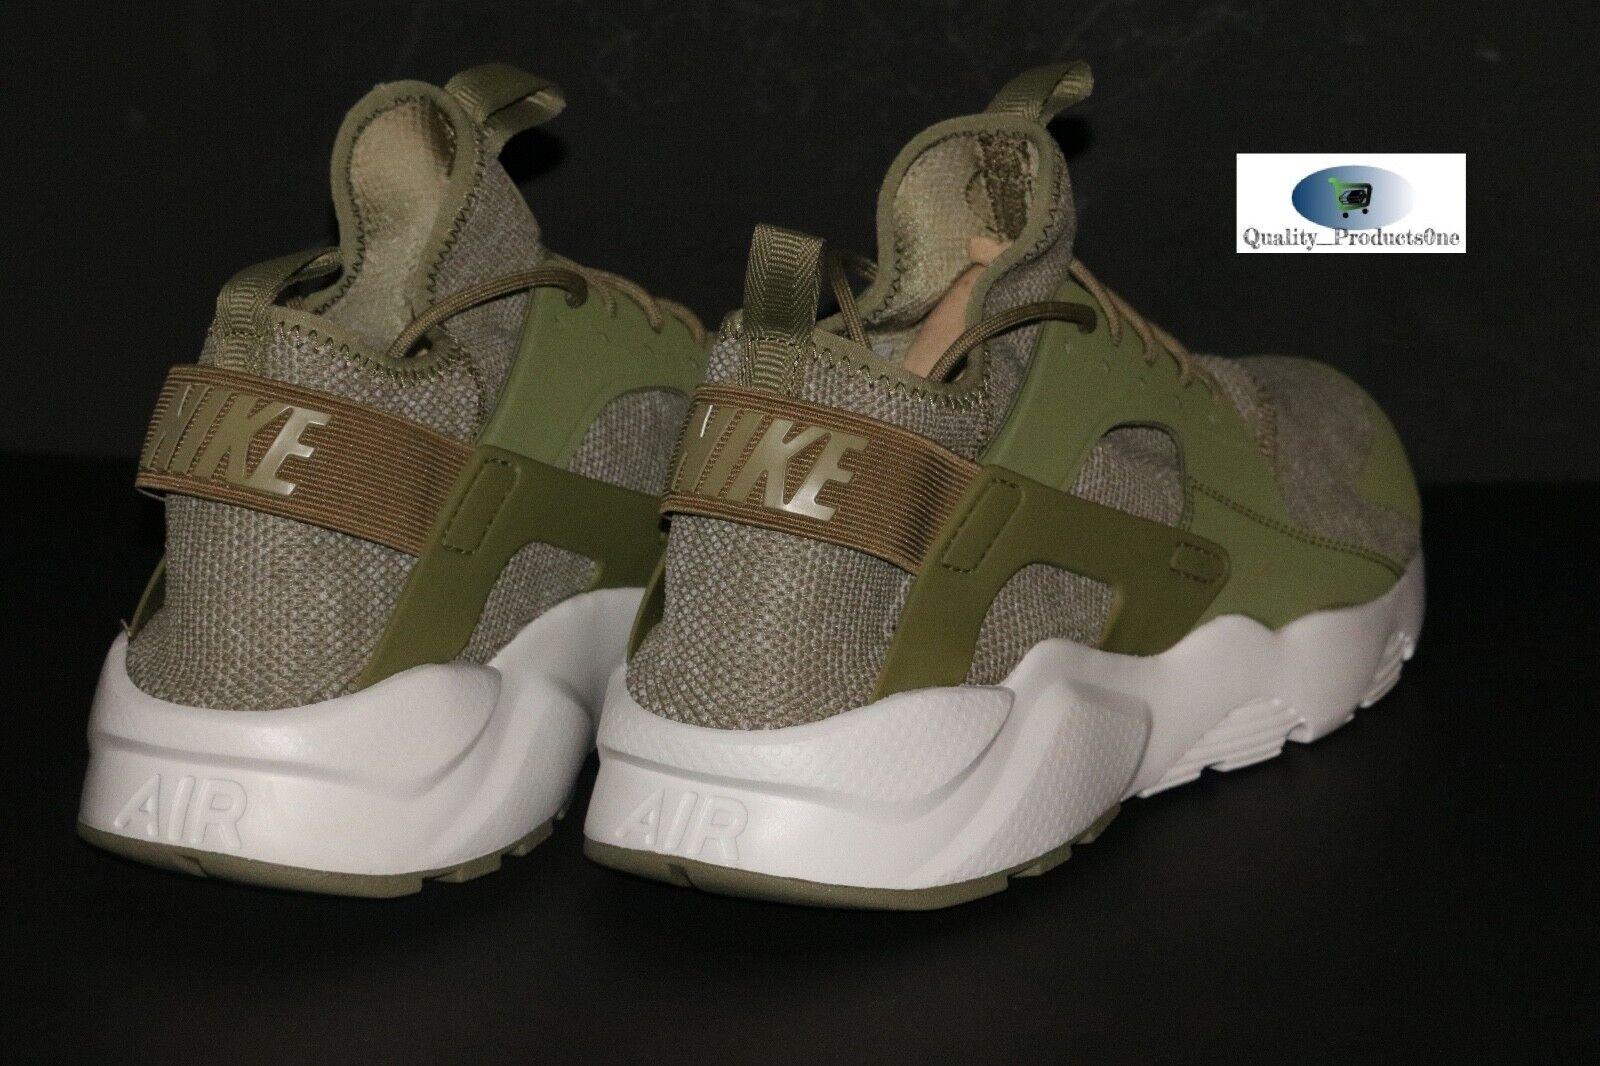 09602959b5ef Nike Air Huarache Run Ultra BR Men Lifestyle SNEAKERS Trooper 833147-201 13